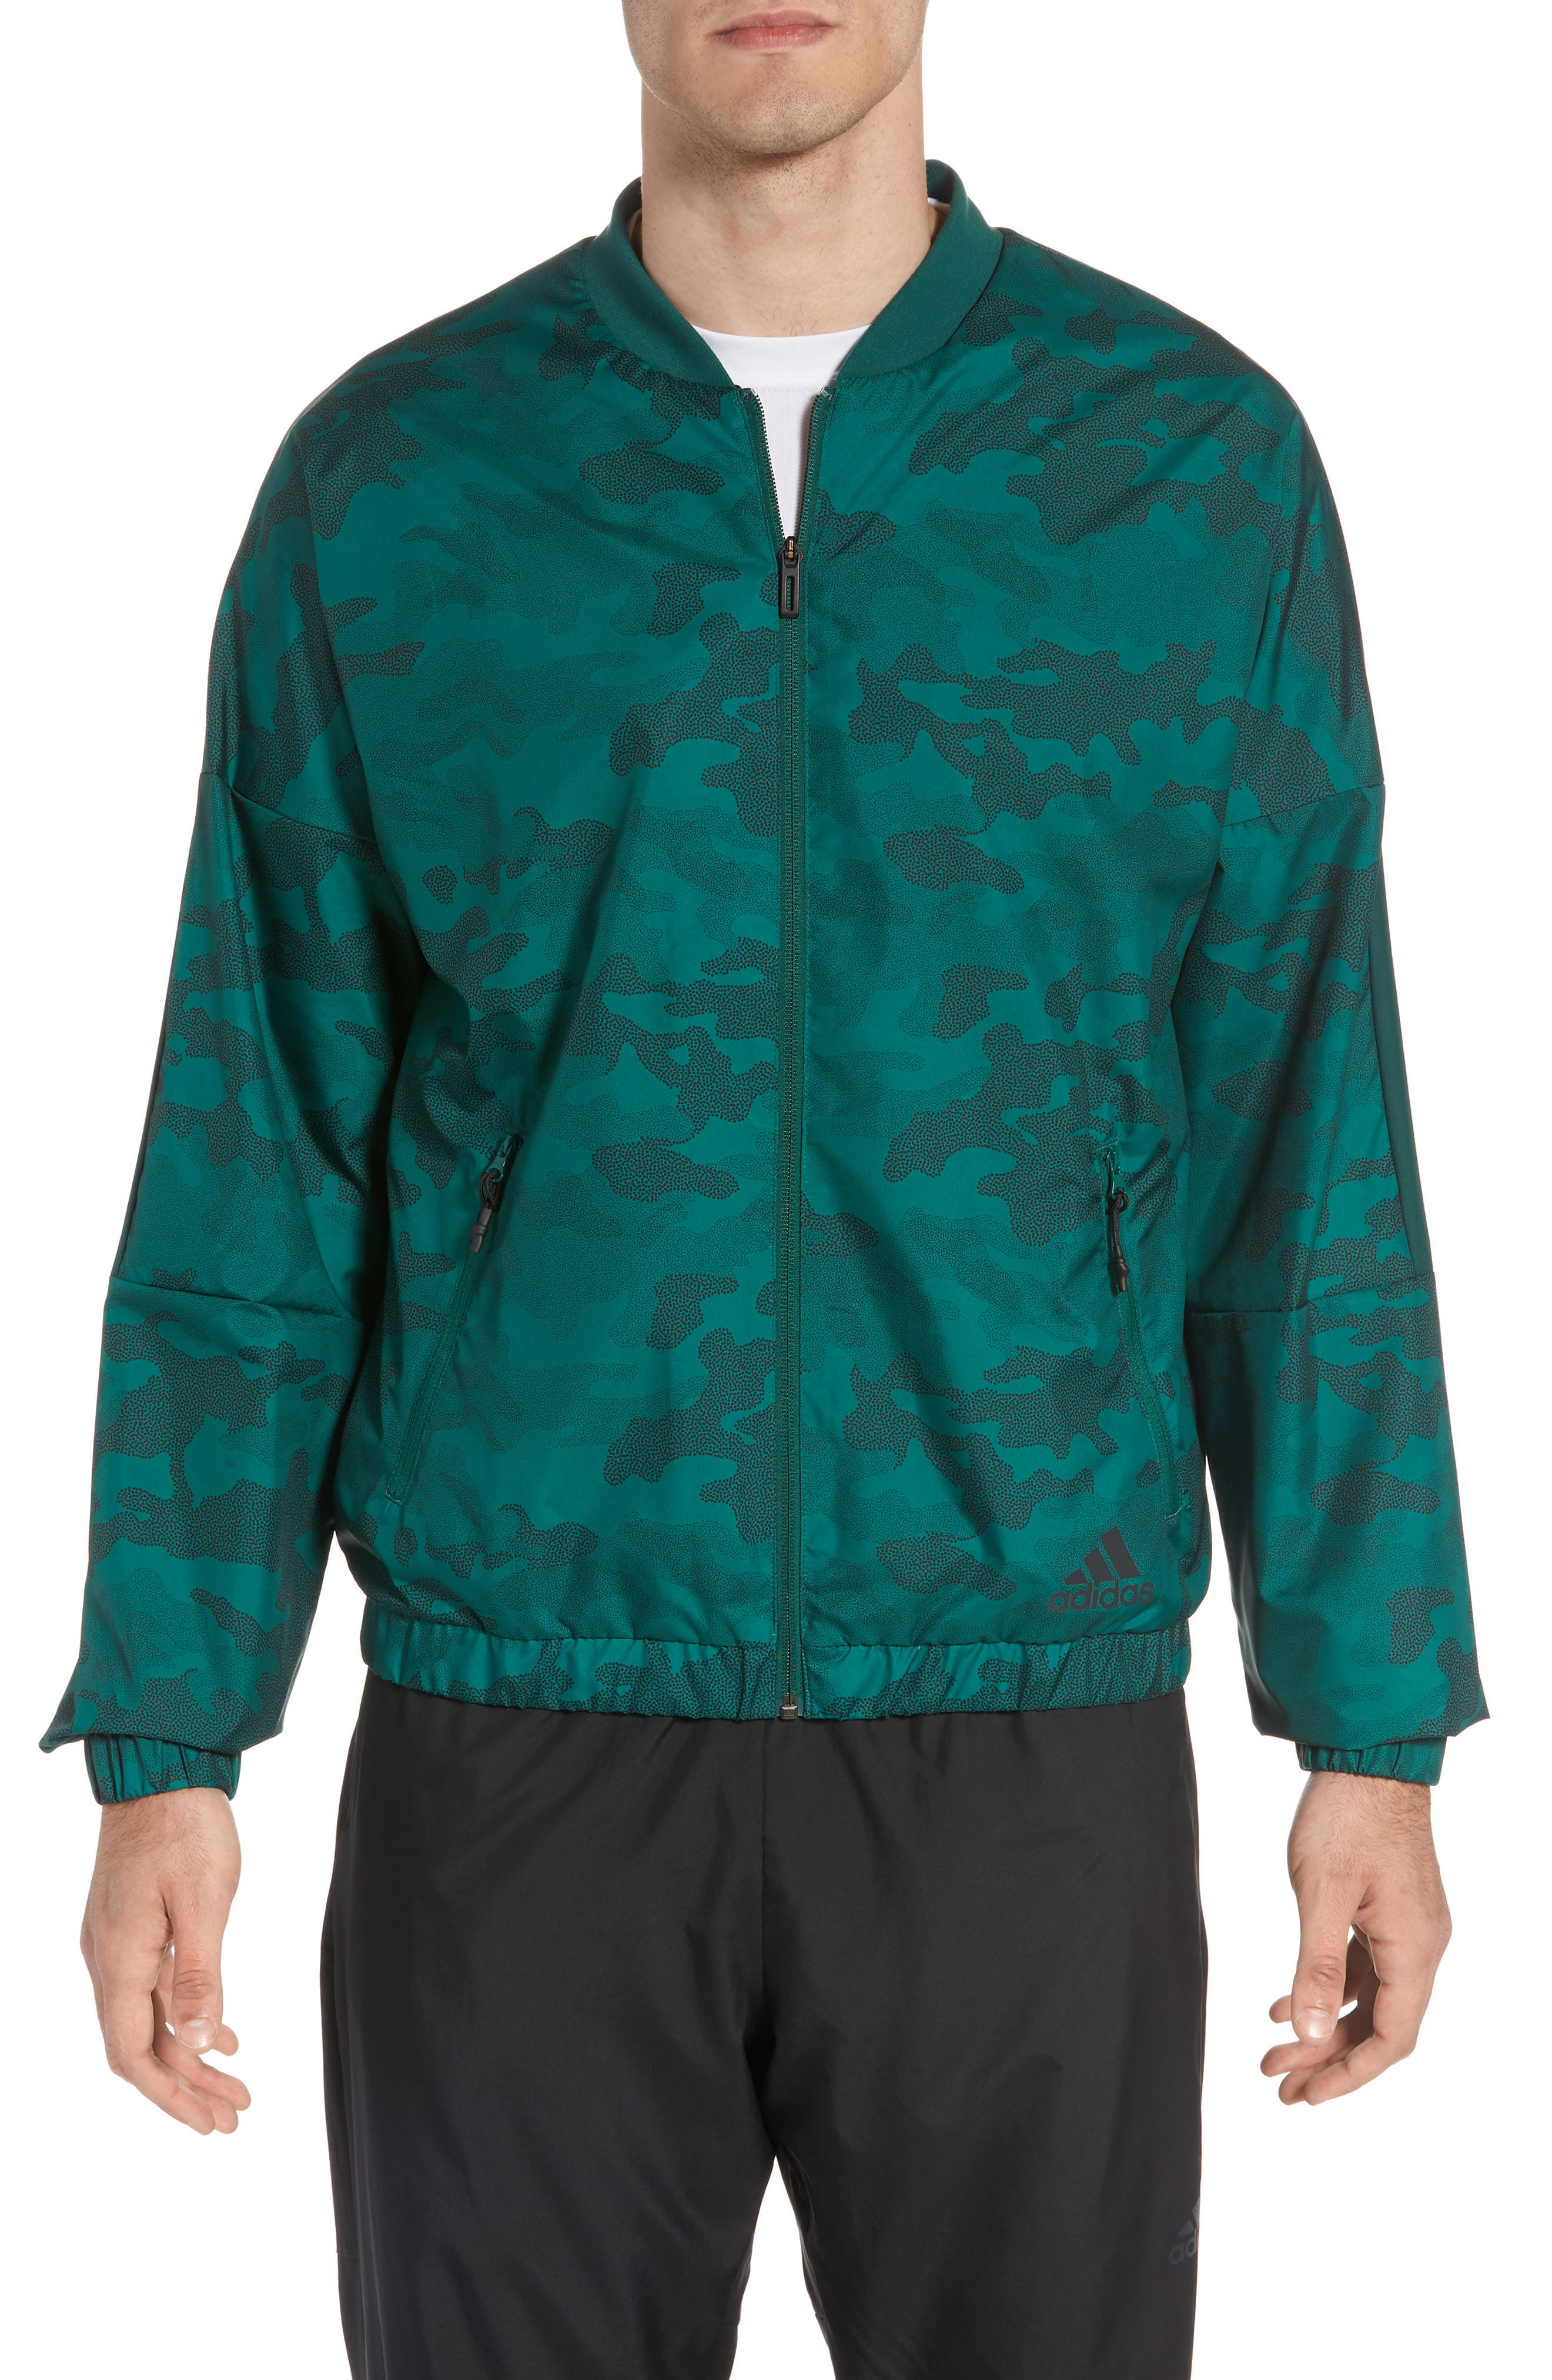 Regular Fit Track Jacket,                             Main thumbnail 1, color,                             Collegiate Green/ Black